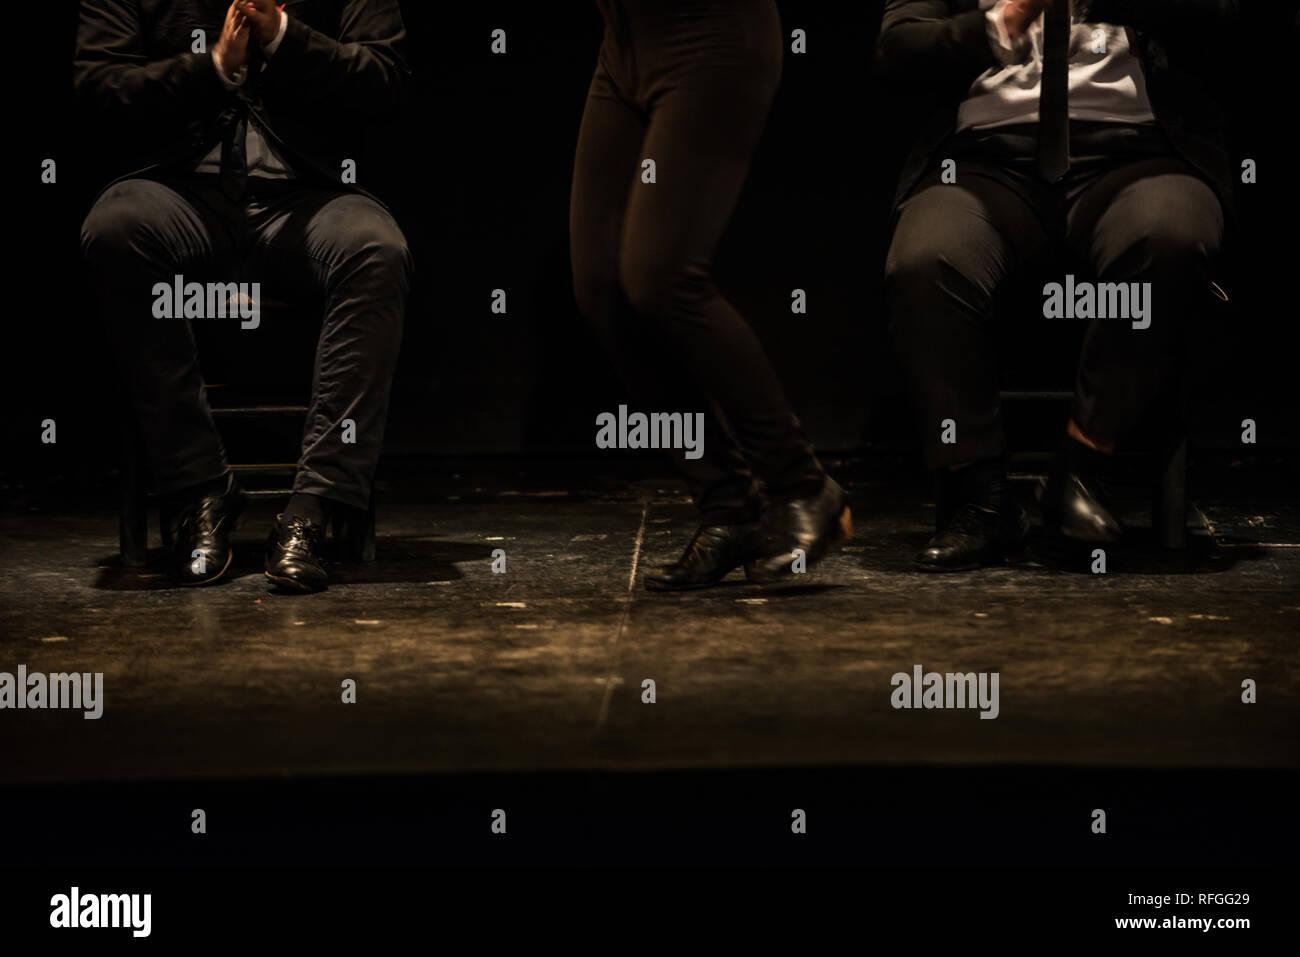 'Emociones' Flamenco show, Teatro Flamenco Madrid, January 2019 - Stock Image